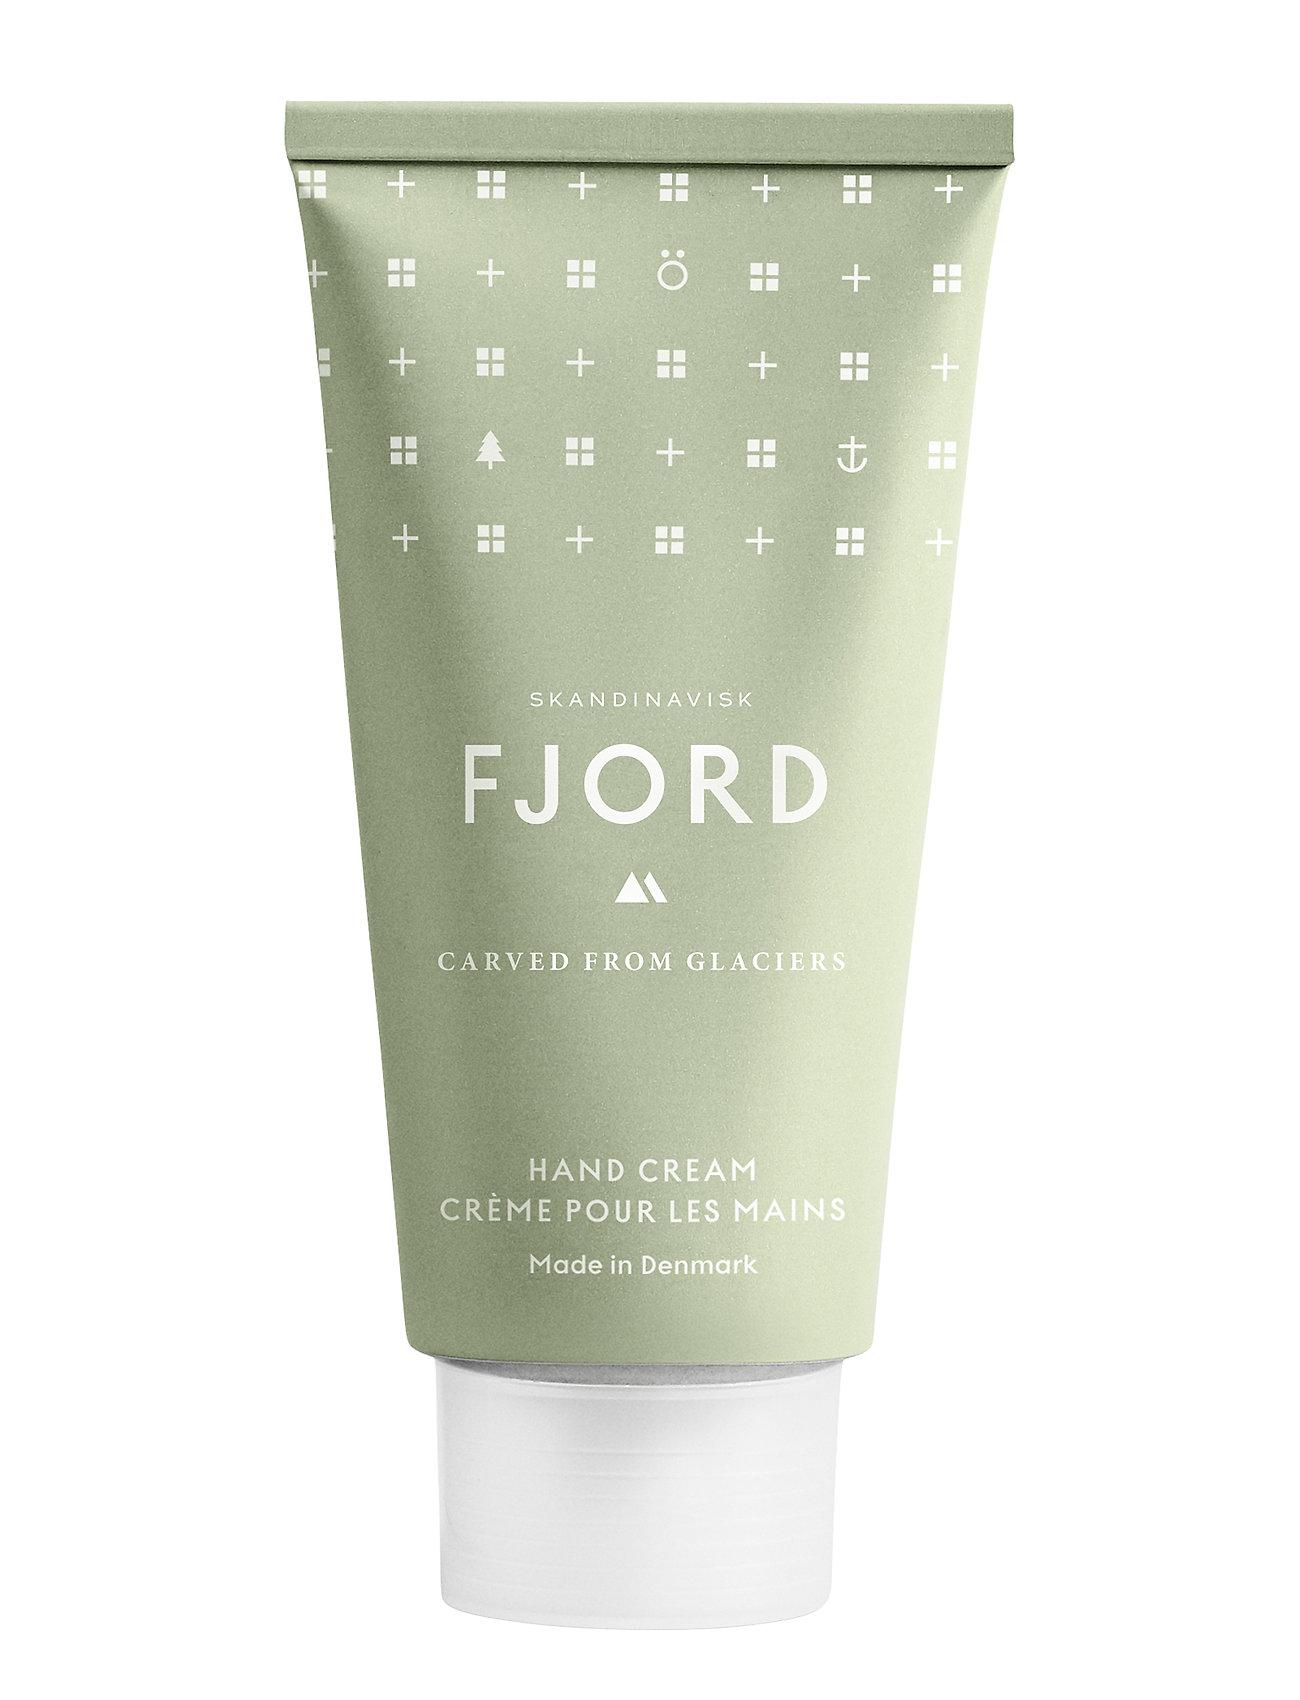 Image of Fjord Hand Cream Beauty WOMEN Skin Care Body Hand Cream & Foot Cream Grøn Skandinavisk (3191655829)